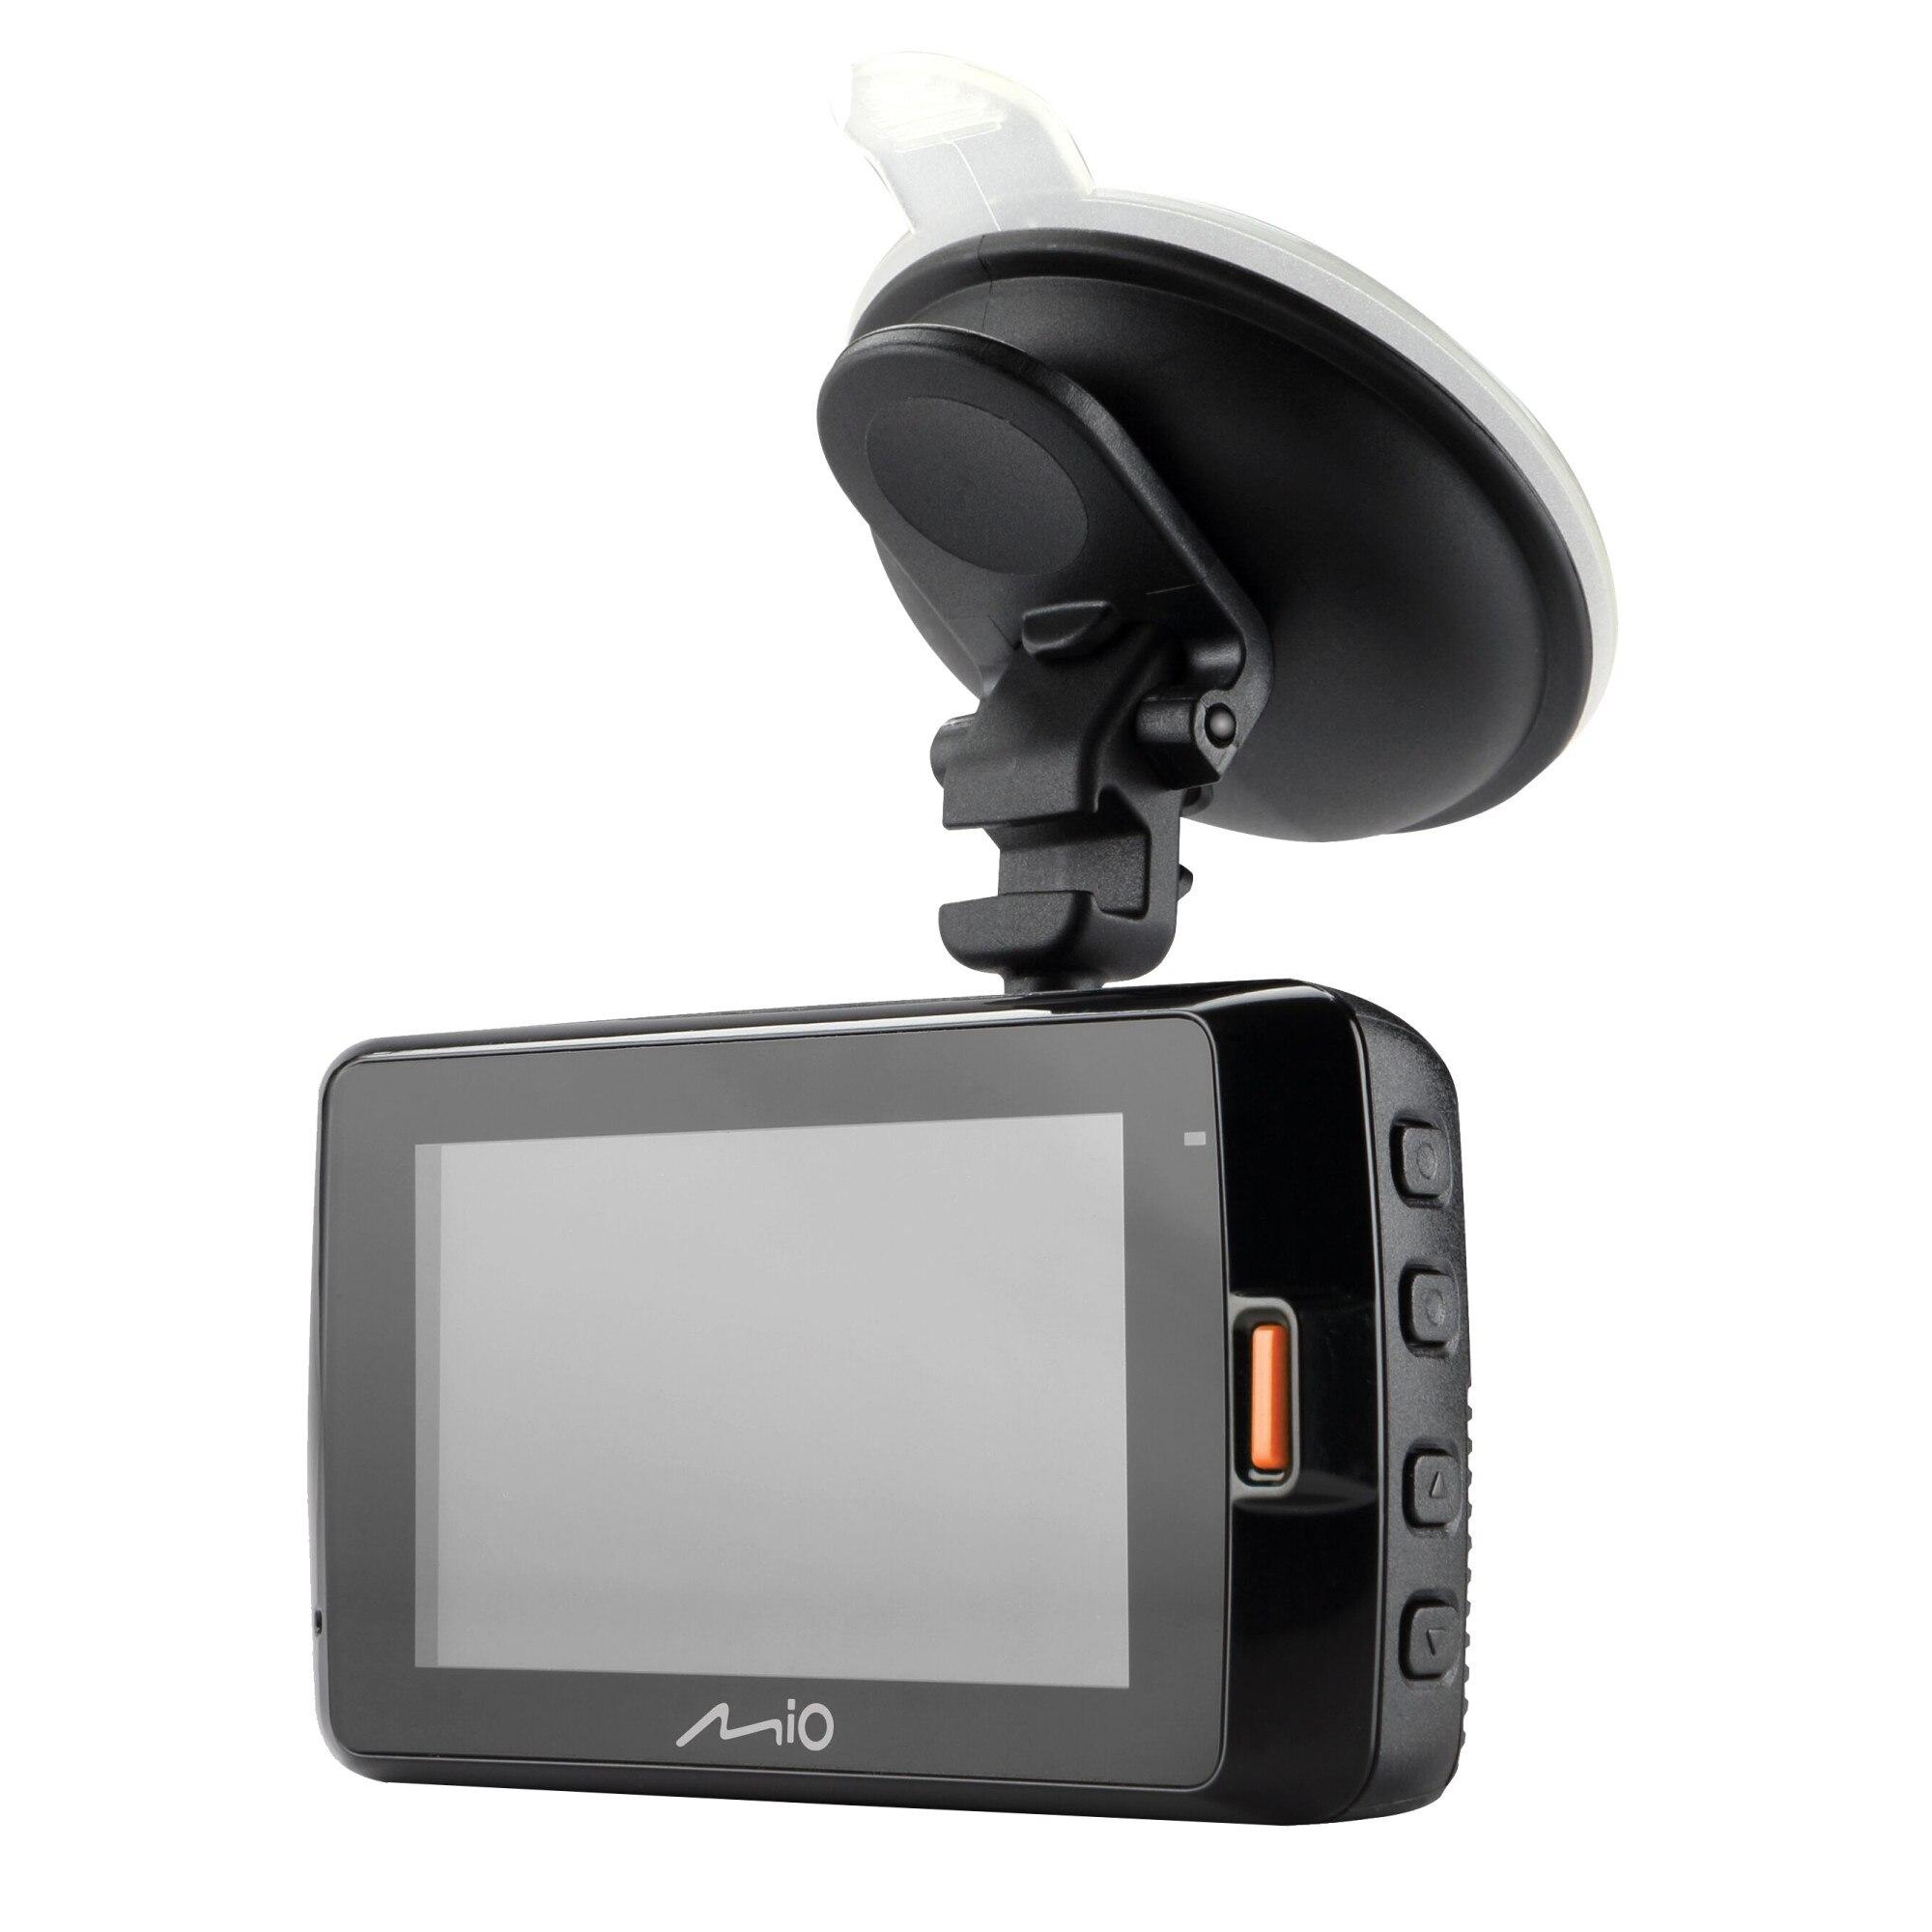 "Fotografie Camera auto DVR Mio MiVue798, QHD, ecran de 2.7"", unghi de 150 grade, senzor Sony Starvis Cmos, Wi-Fi, GPS încorporat, negru"